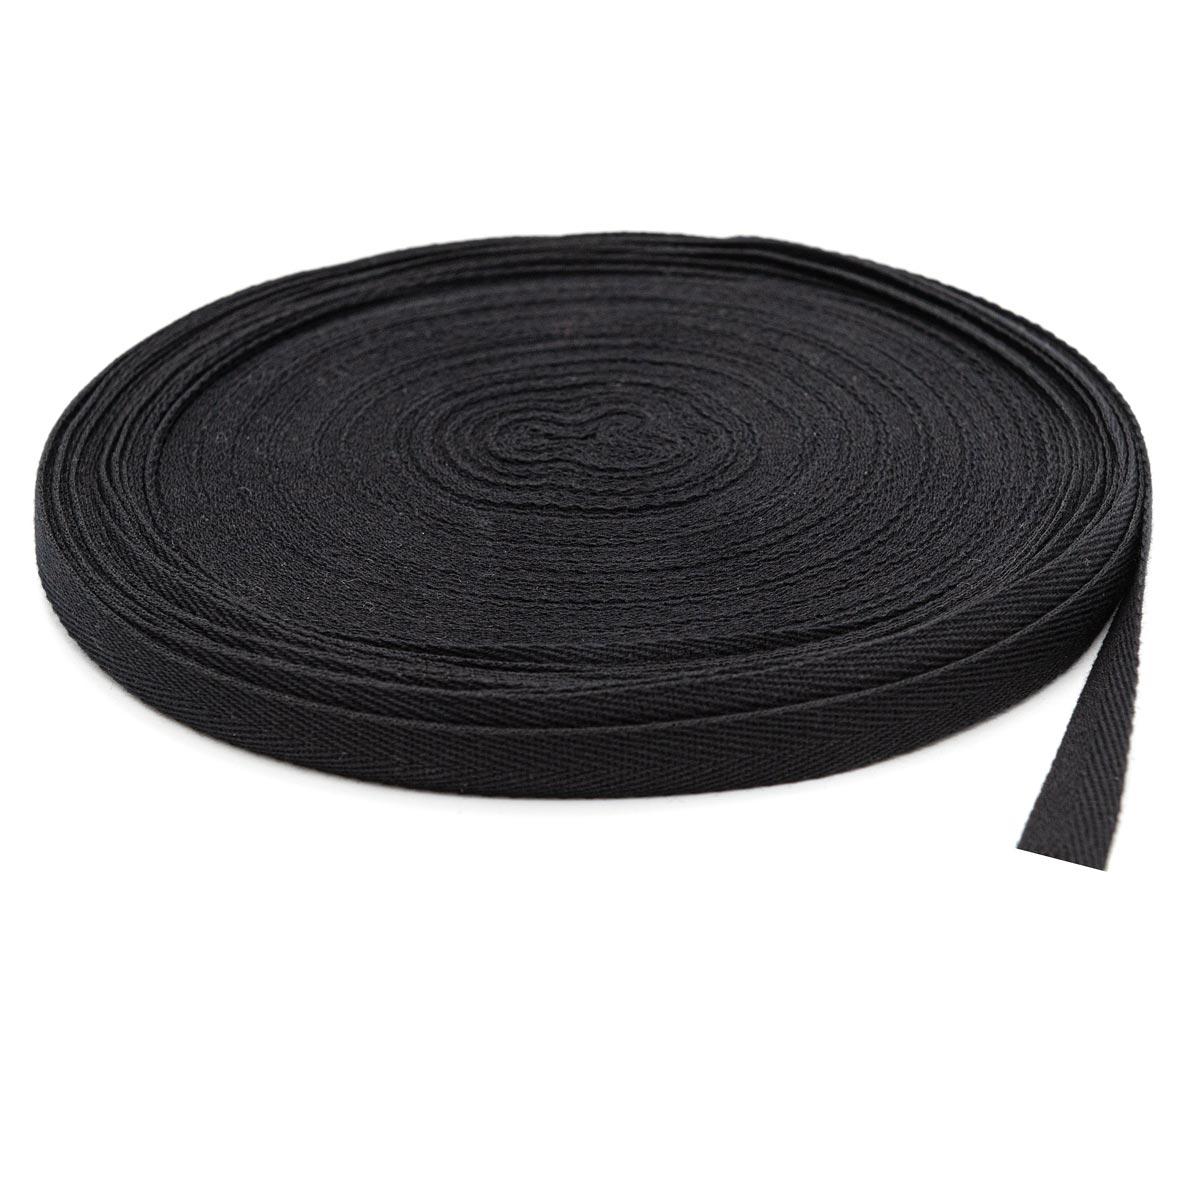 1015Ч Лента киперная 15мм*50м, черная